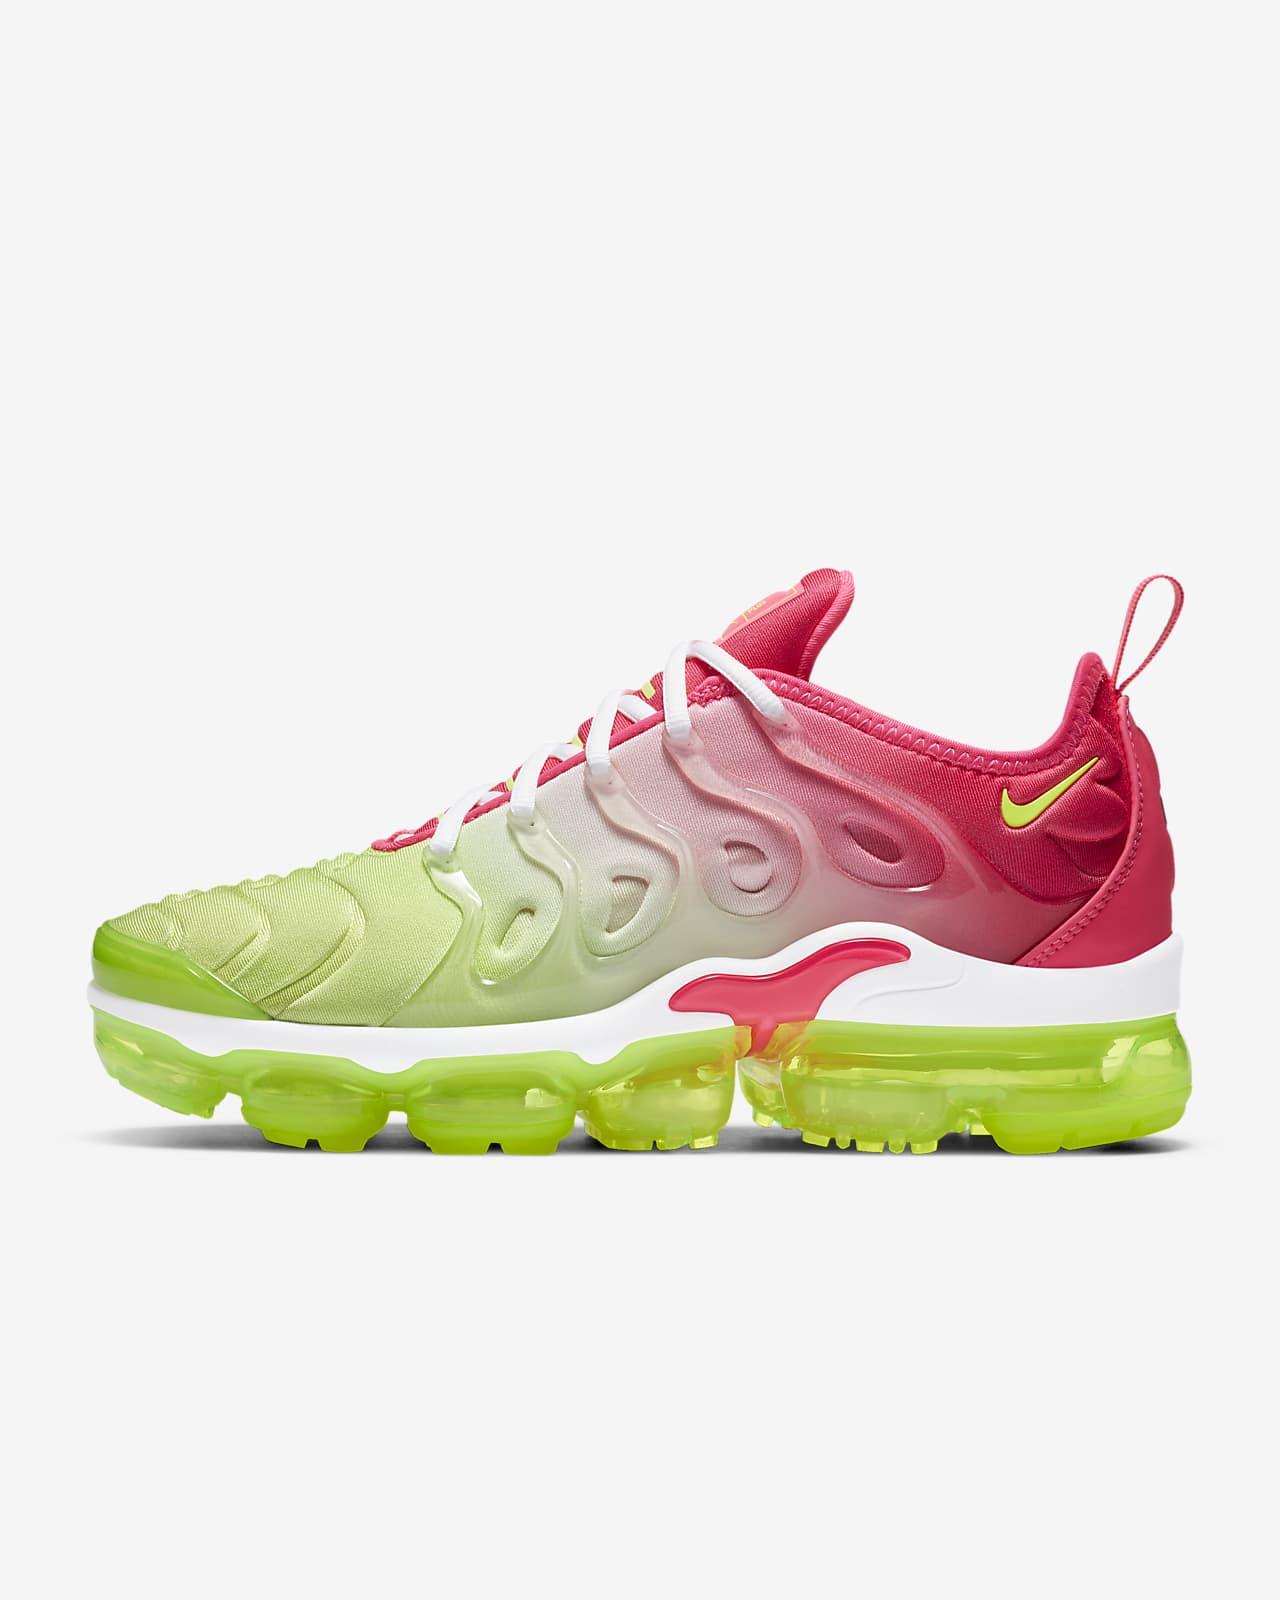 salud herir Evaporar  Nike Air VaporMax Plus Women's Shoe. Nike.com